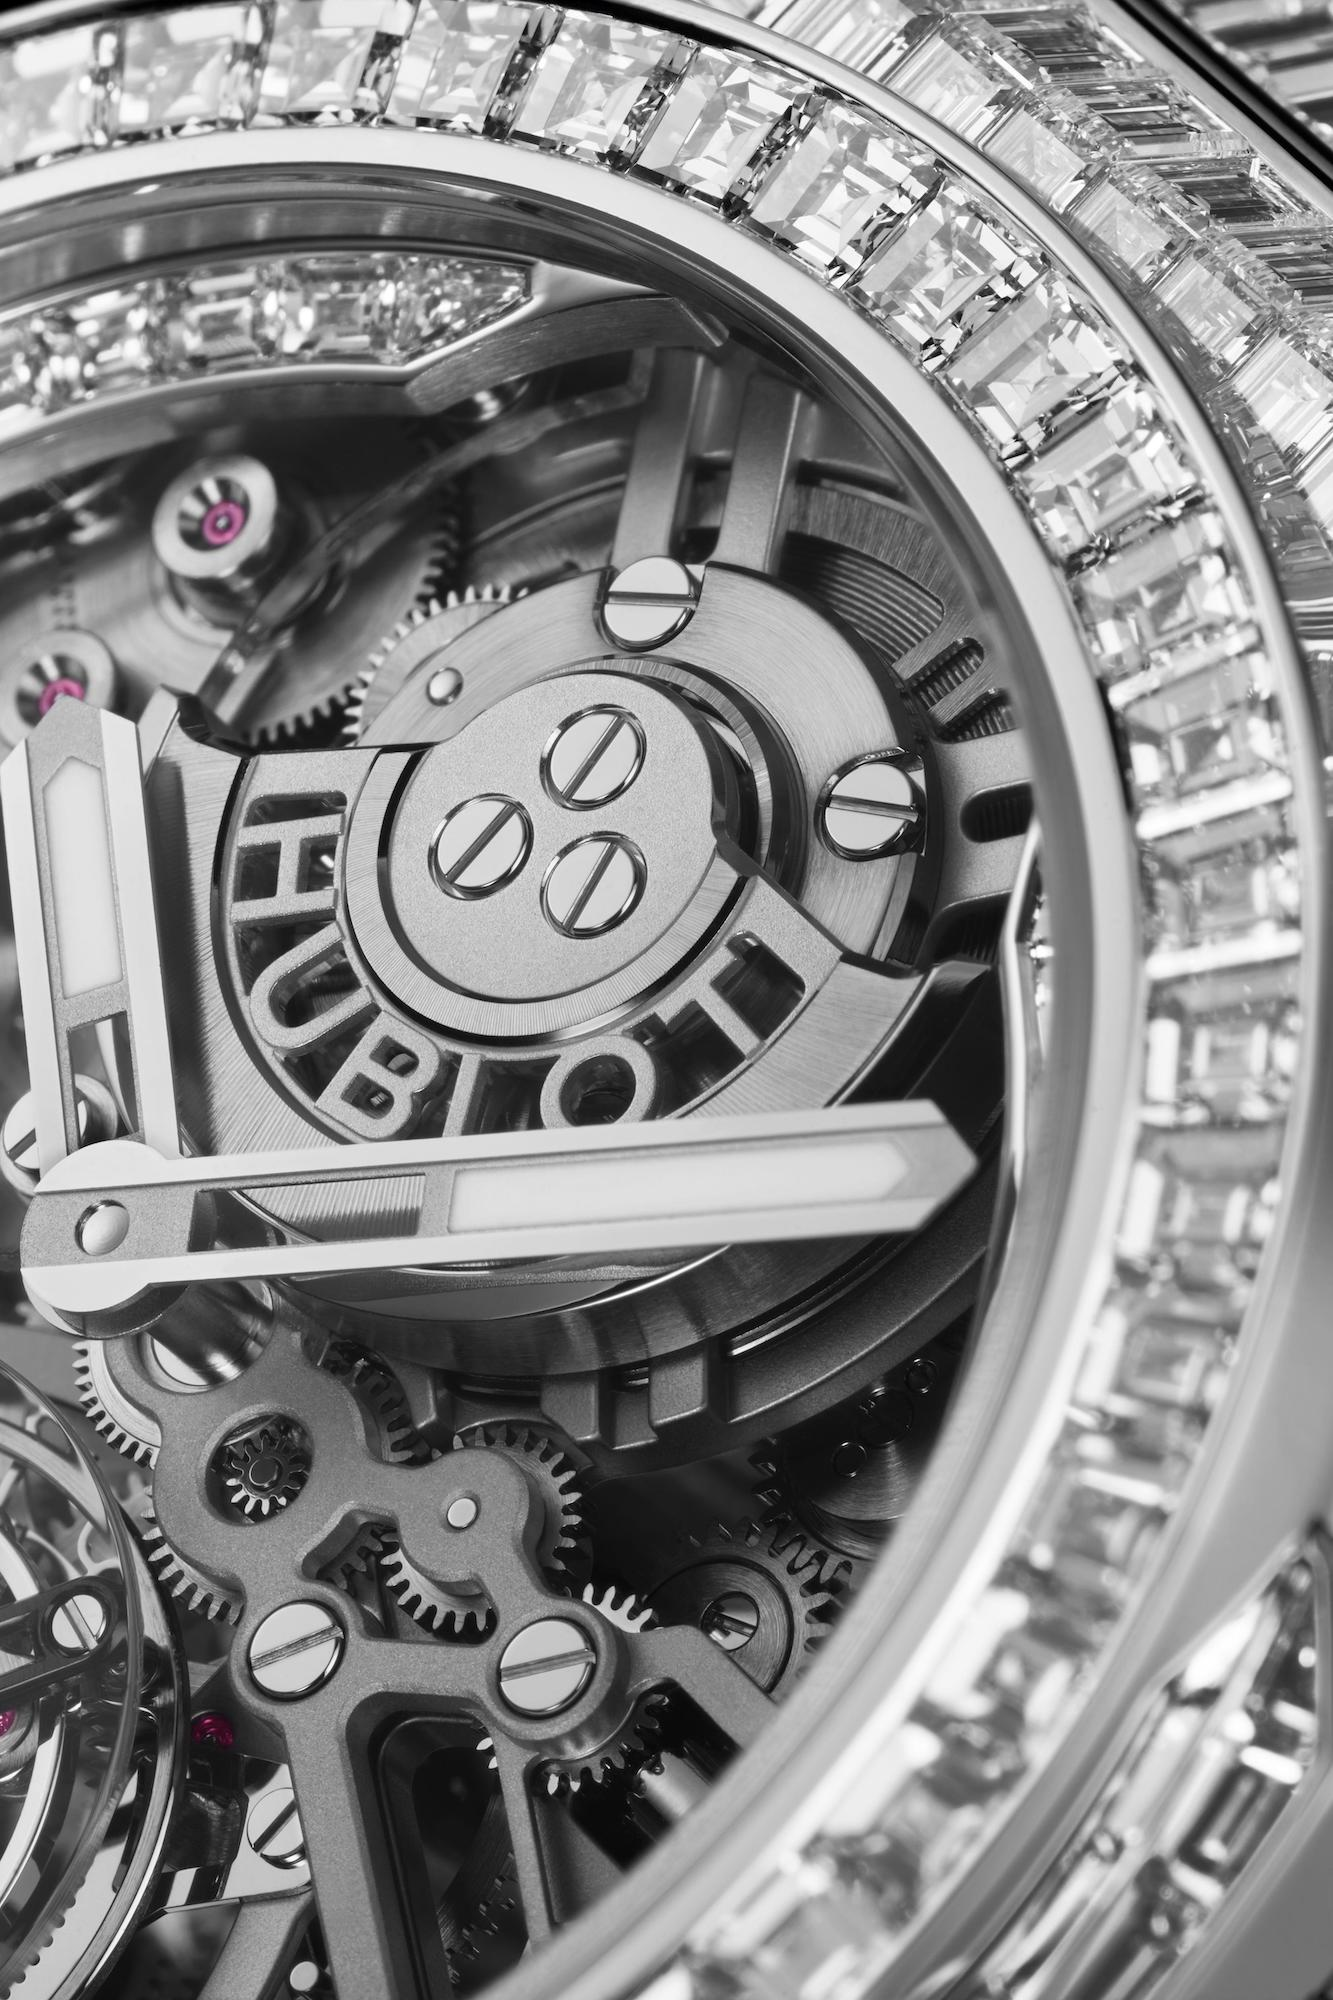 Hublot Big Bang Integral Tourbillon High Jewellery 455.WX.9000.WX.9904 Detalle esfera